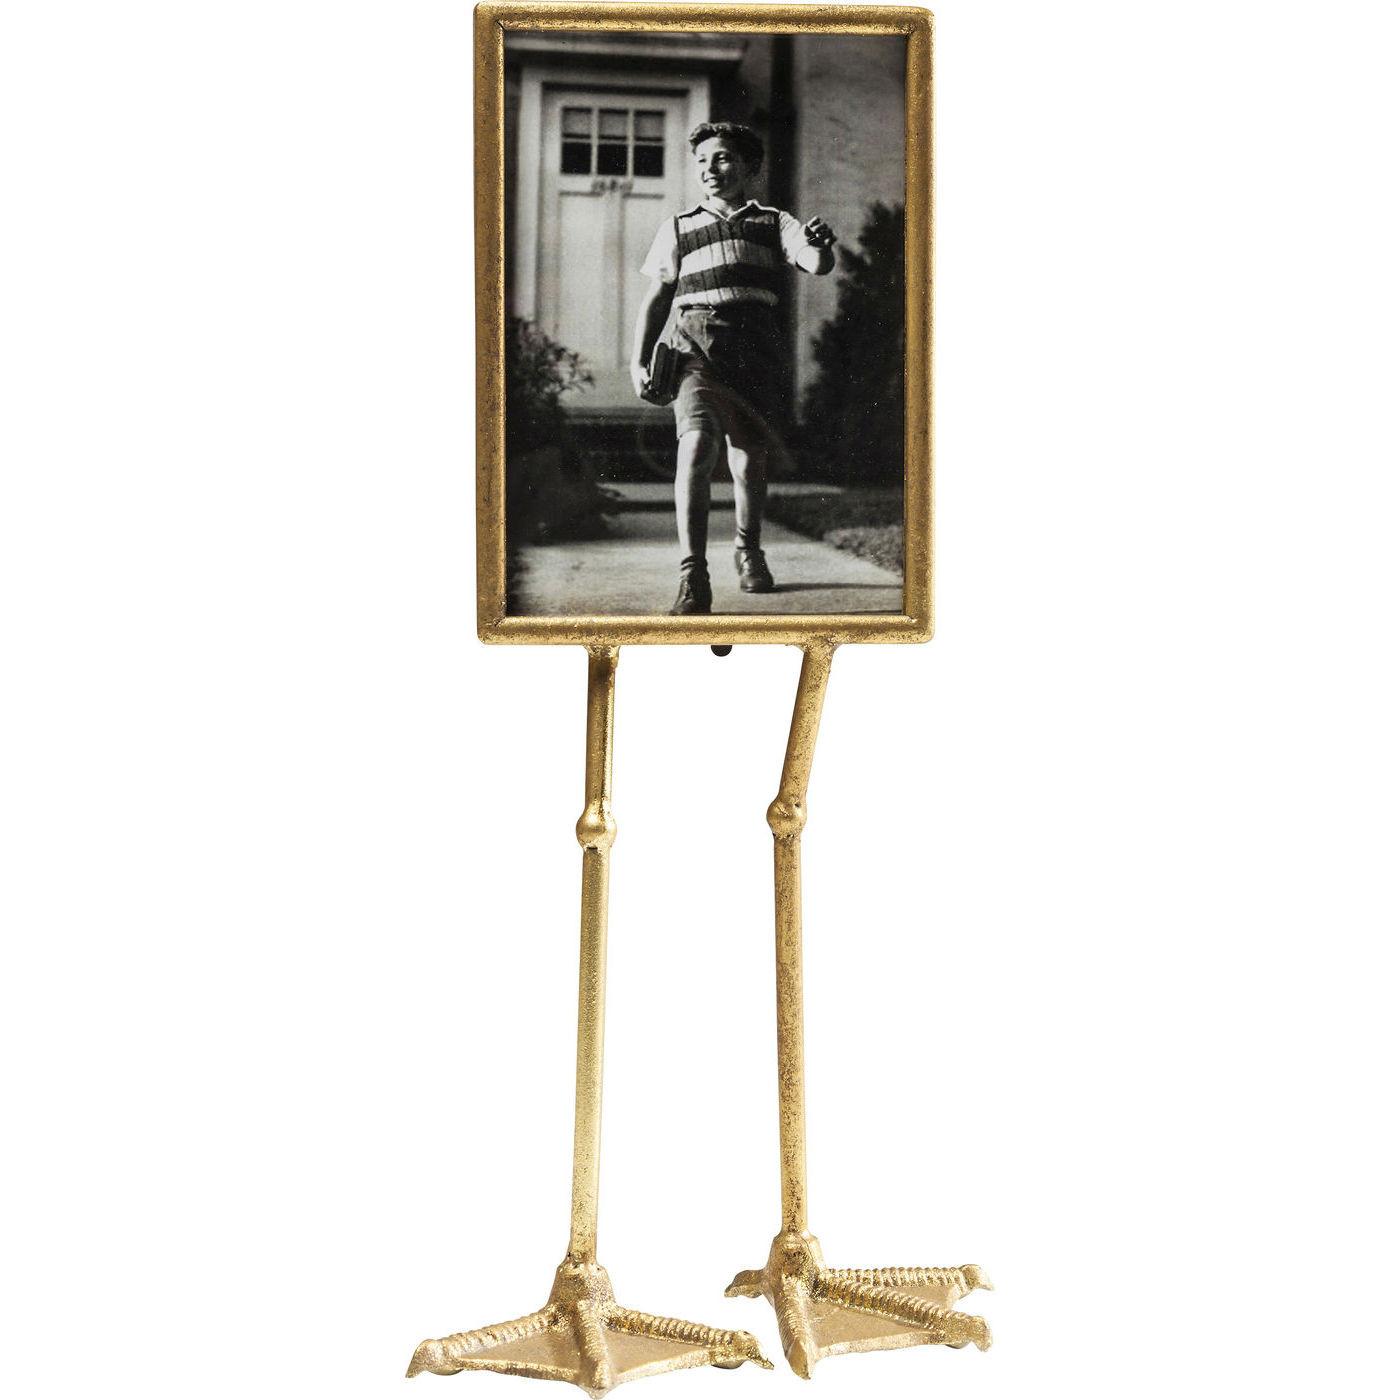 rahmen duck feet vertical 13x18cm kare design mutoni m bel. Black Bedroom Furniture Sets. Home Design Ideas